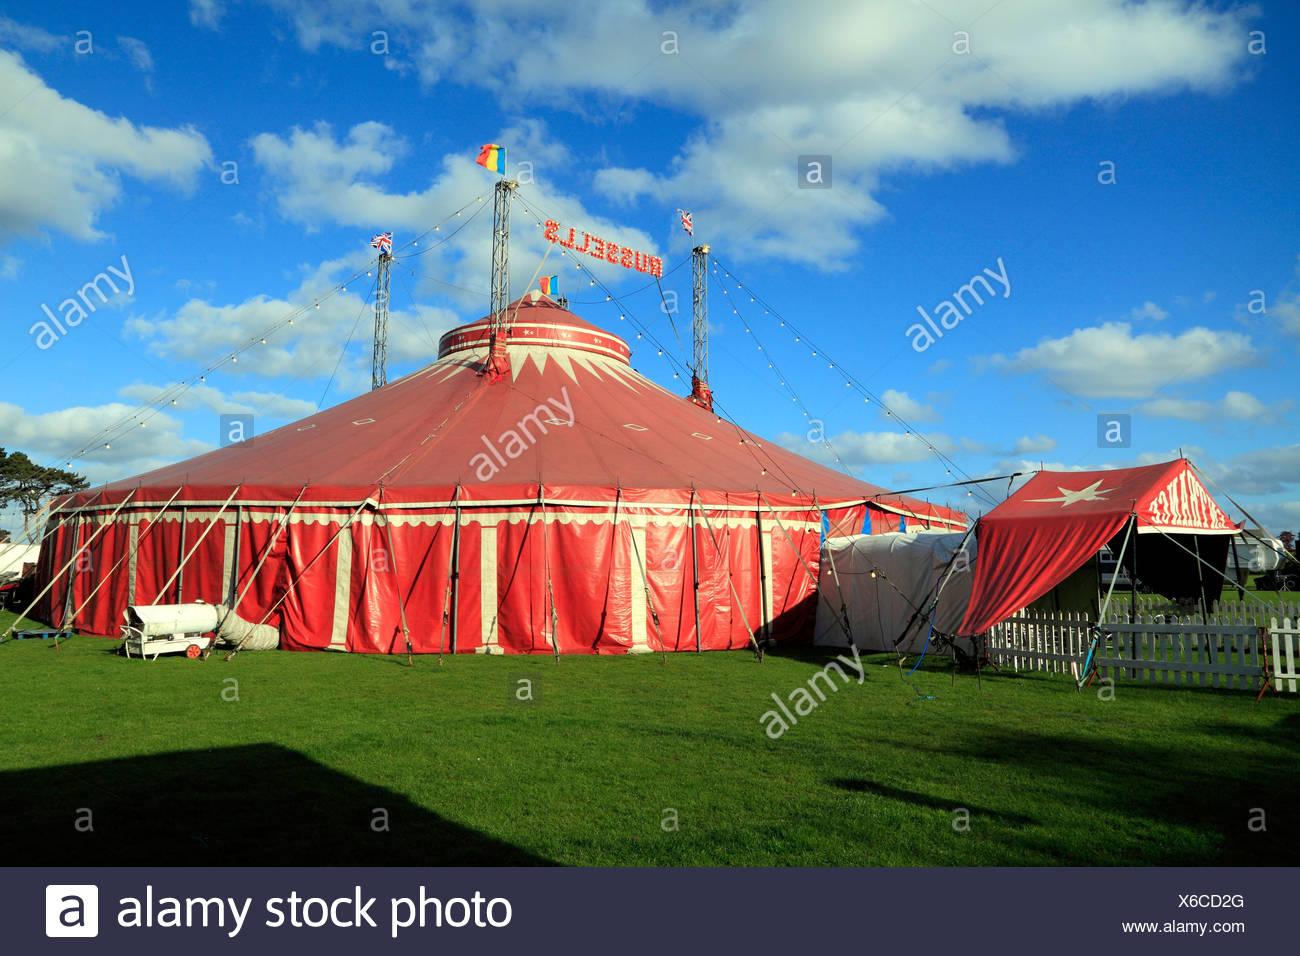 Russells International Circus, UK travelling circus shows, Big Top tent, Norfolk, England - Stock Image